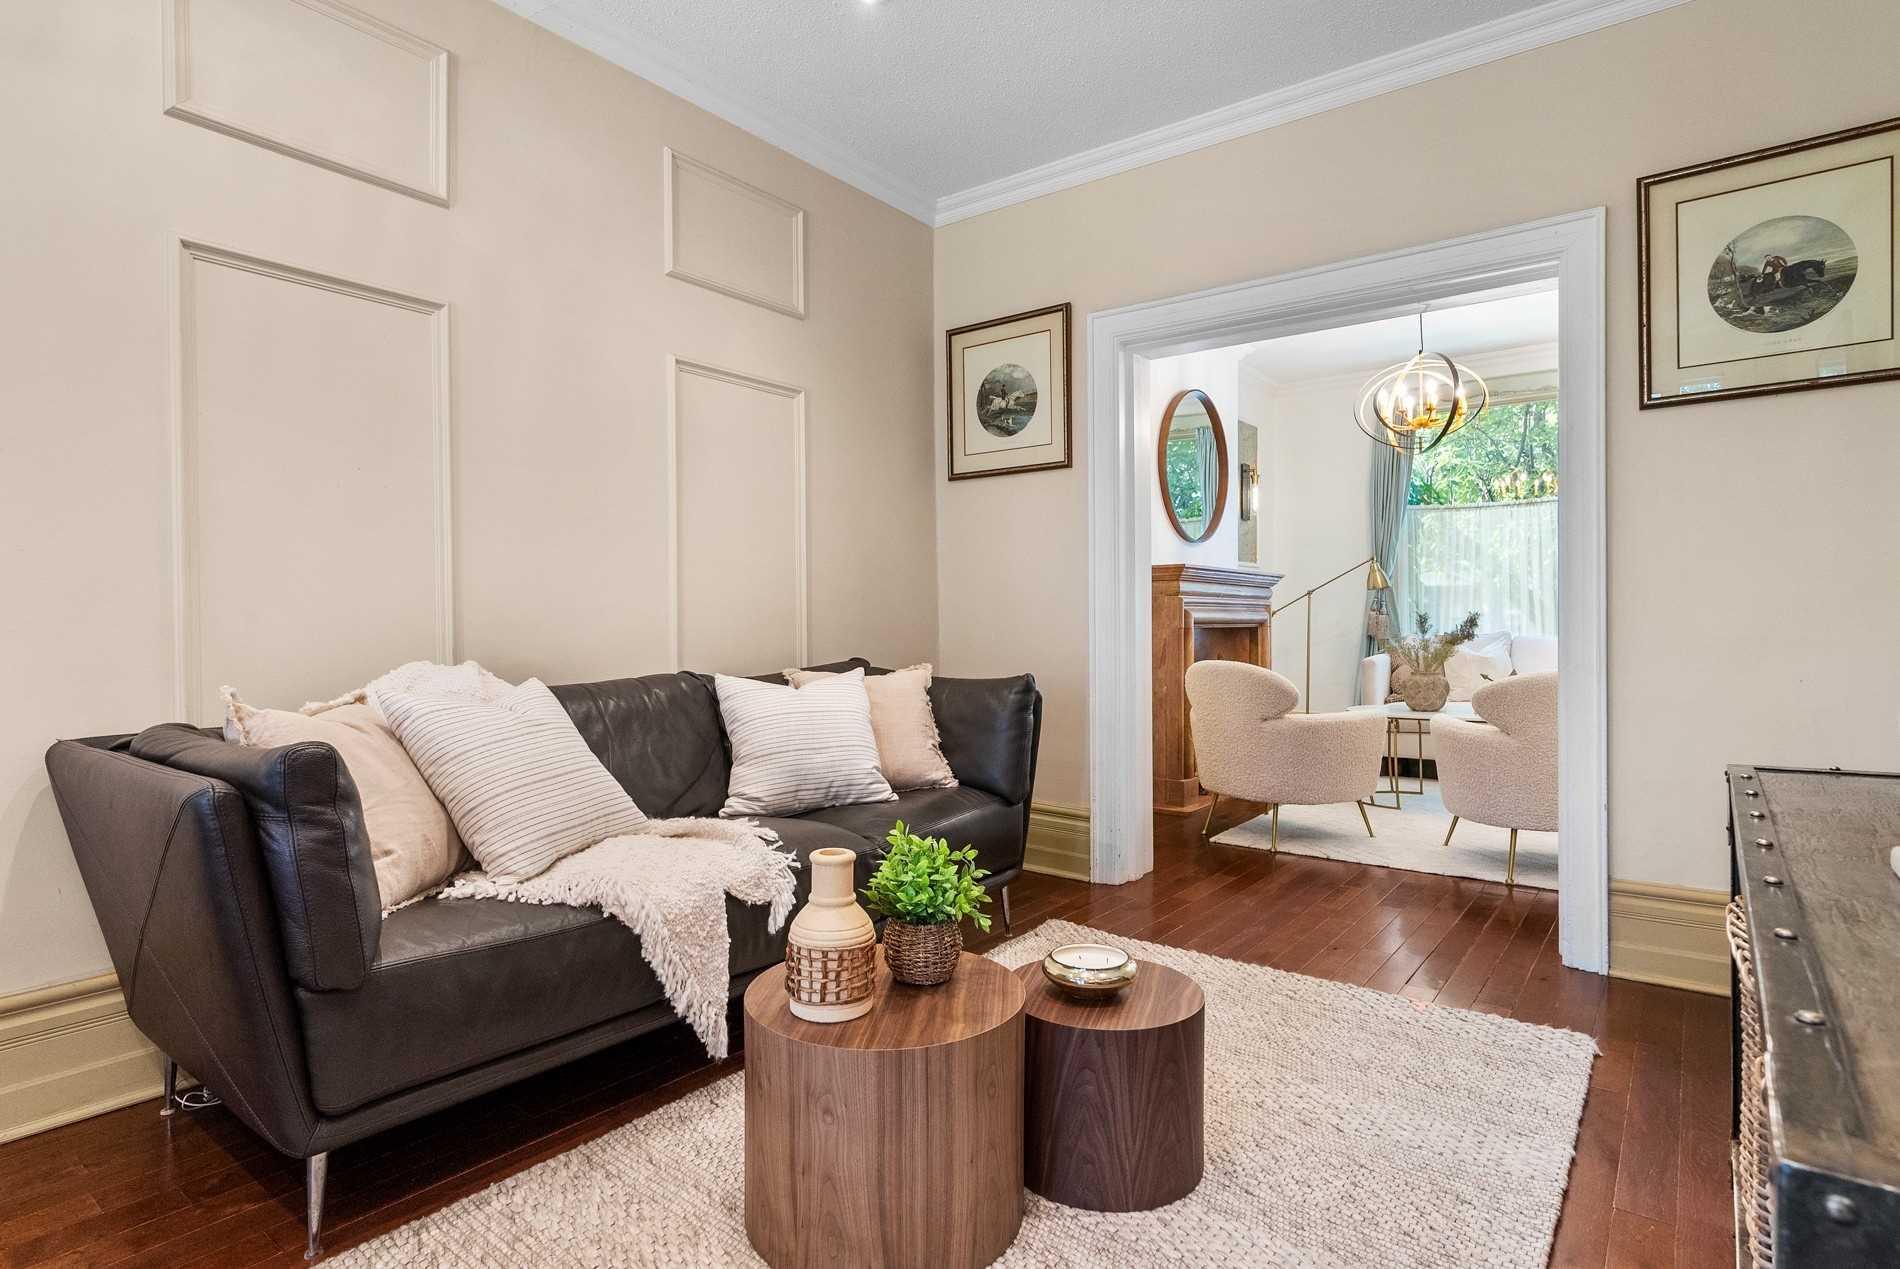 Detached house For Sale In Toronto - 2145 Gerrard St, Toronto, Ontario, Canada M4E2C1 , 3 Bedrooms Bedrooms, ,3 BathroomsBathrooms,Detached,For Sale,Gerrard